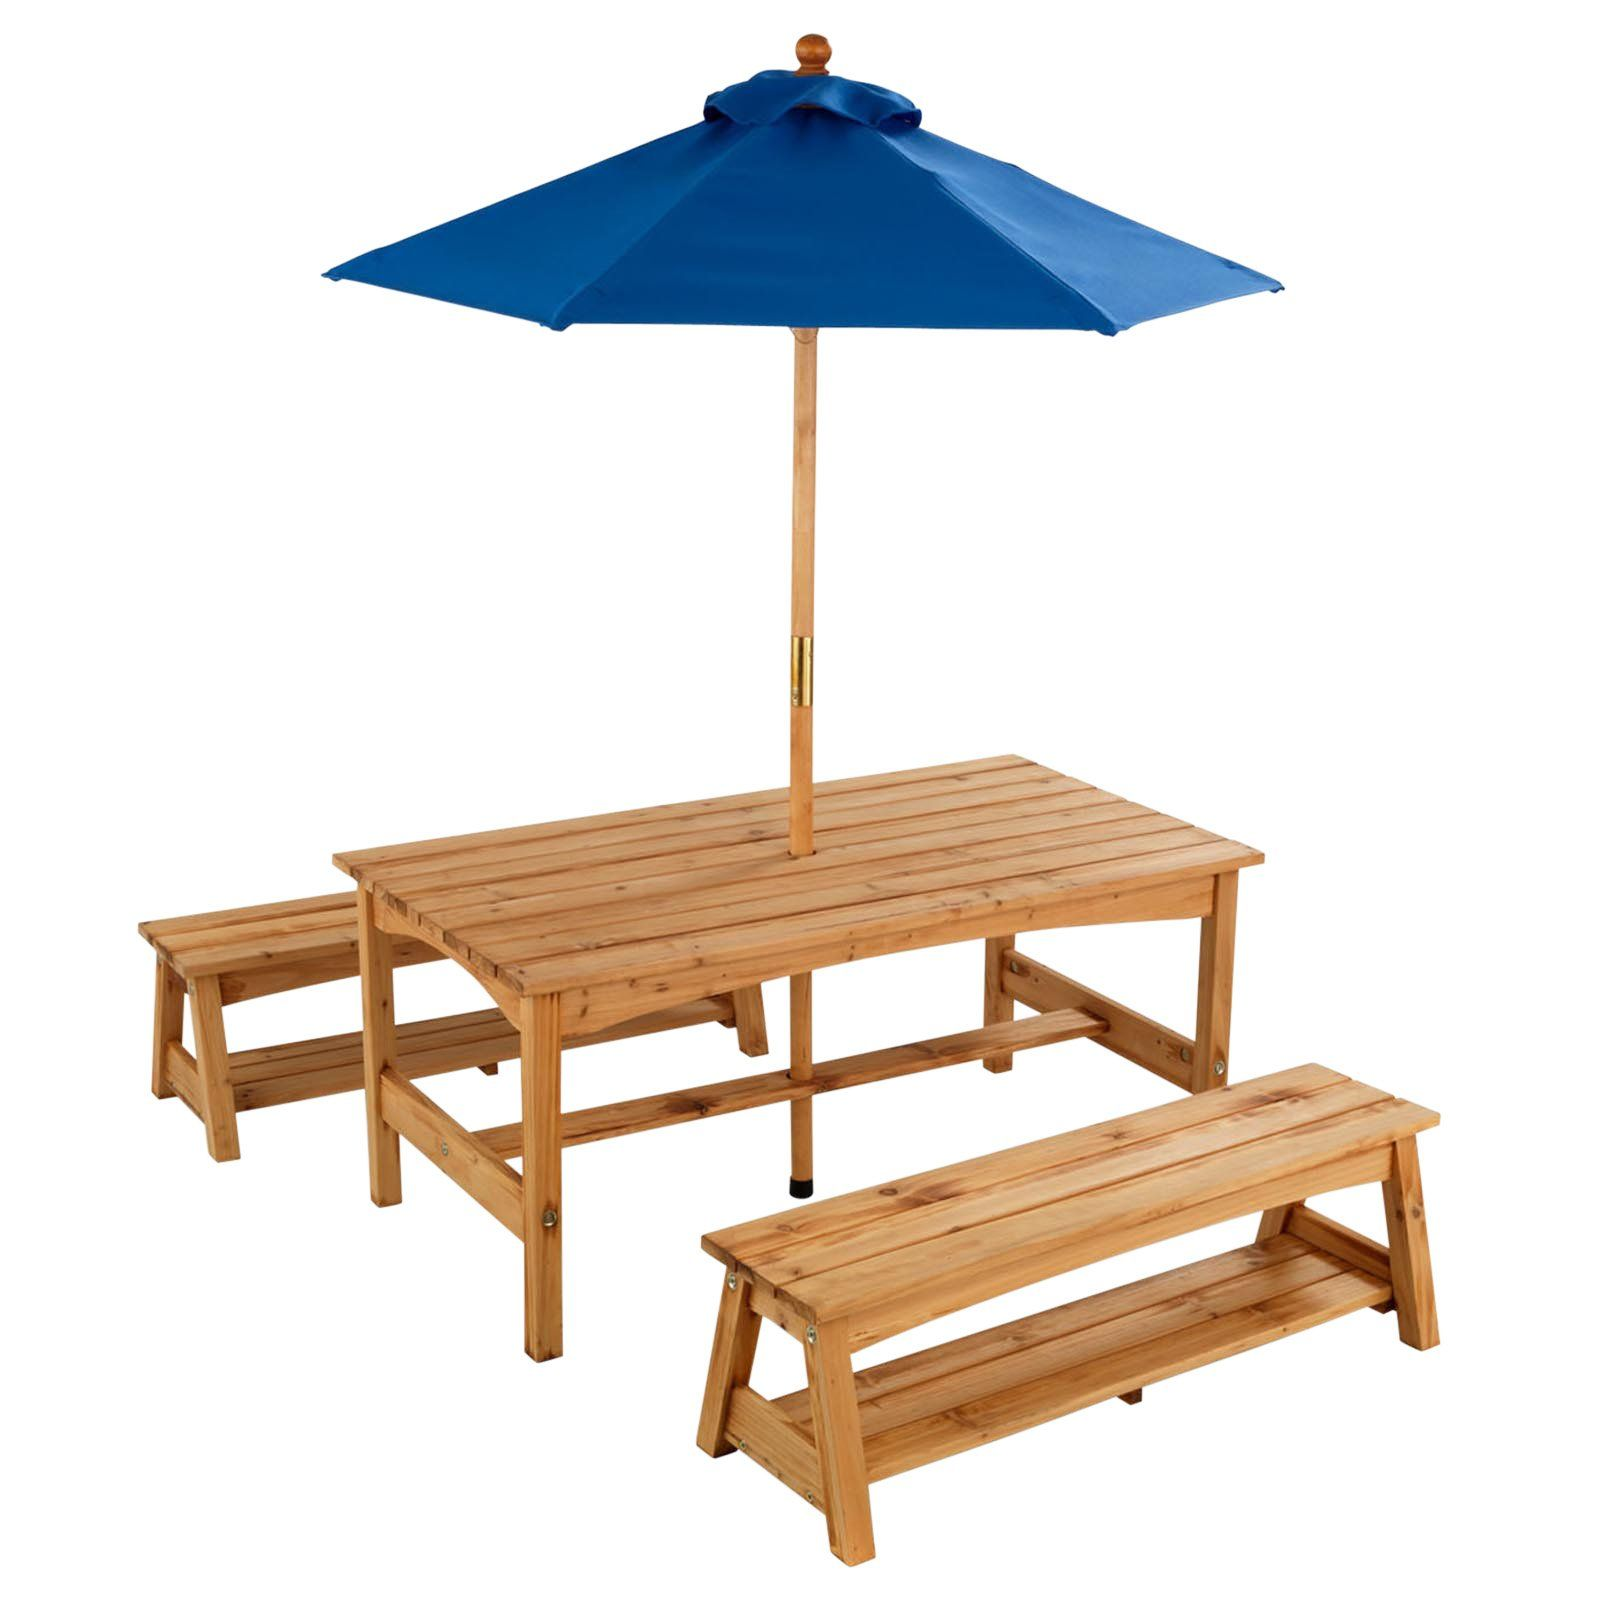 patio table umbrella: patio table umbrella assembled ~ home